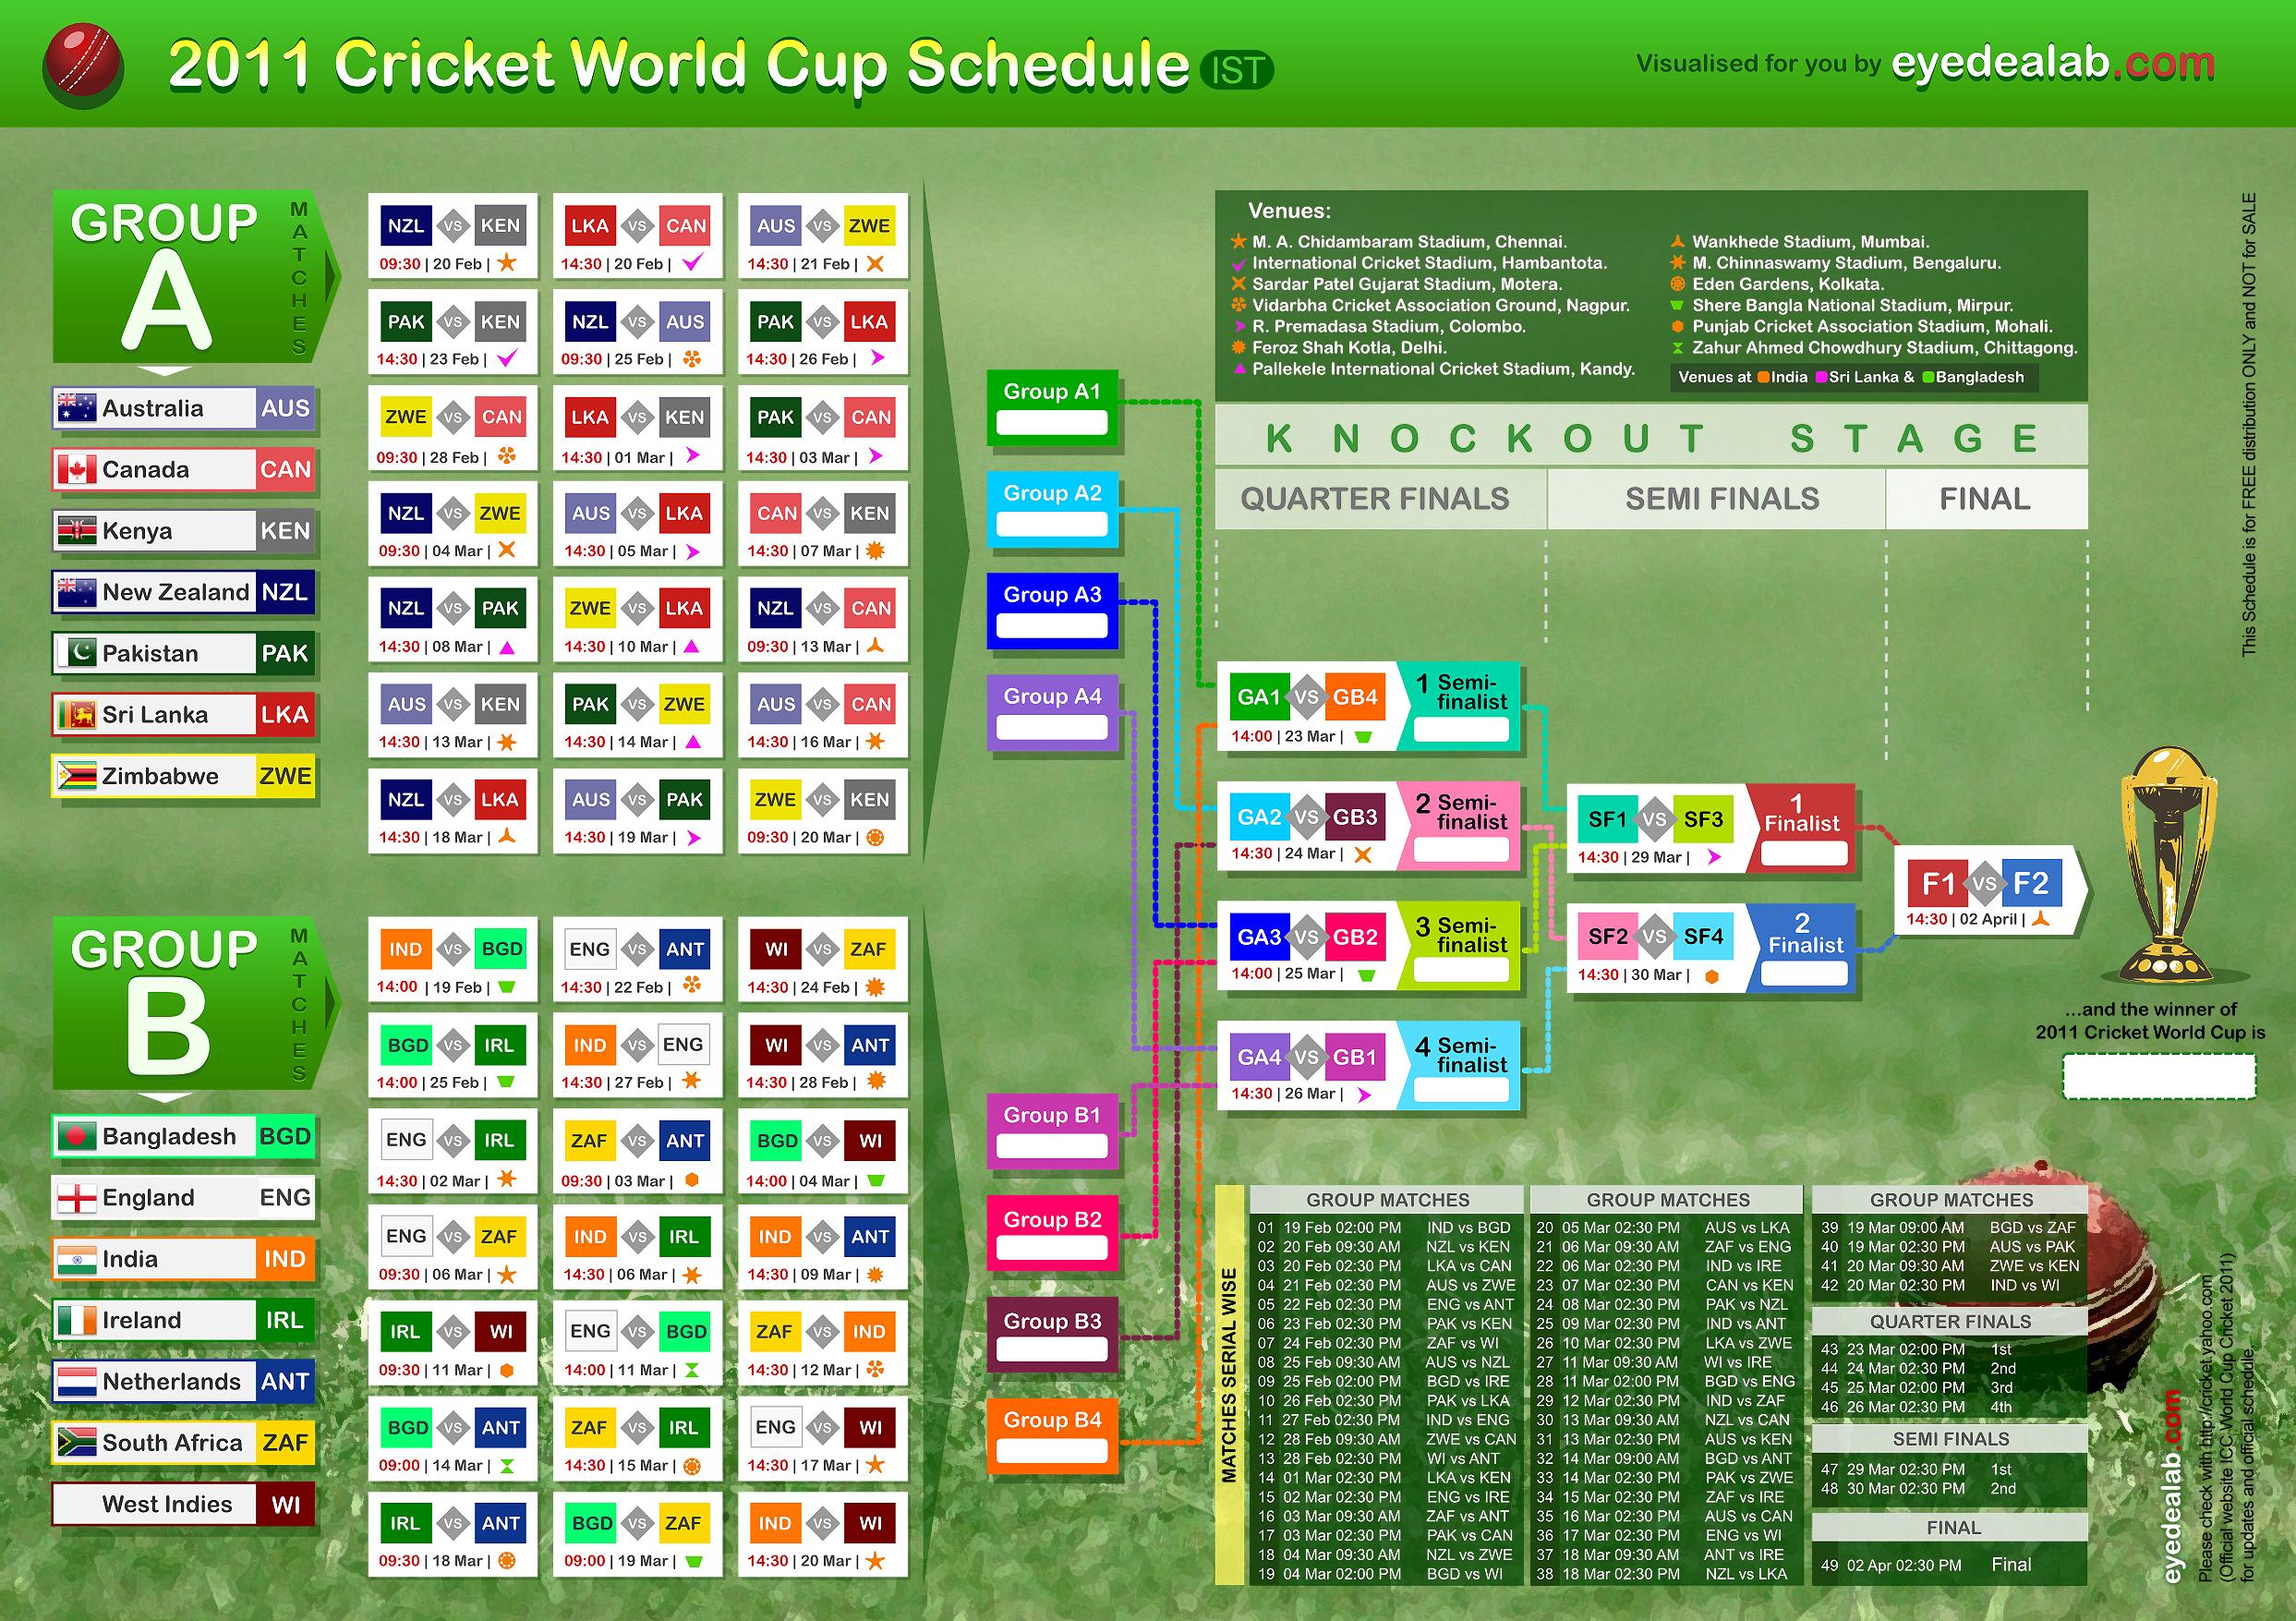 Icc Cricket World Cup 2011 Schedule